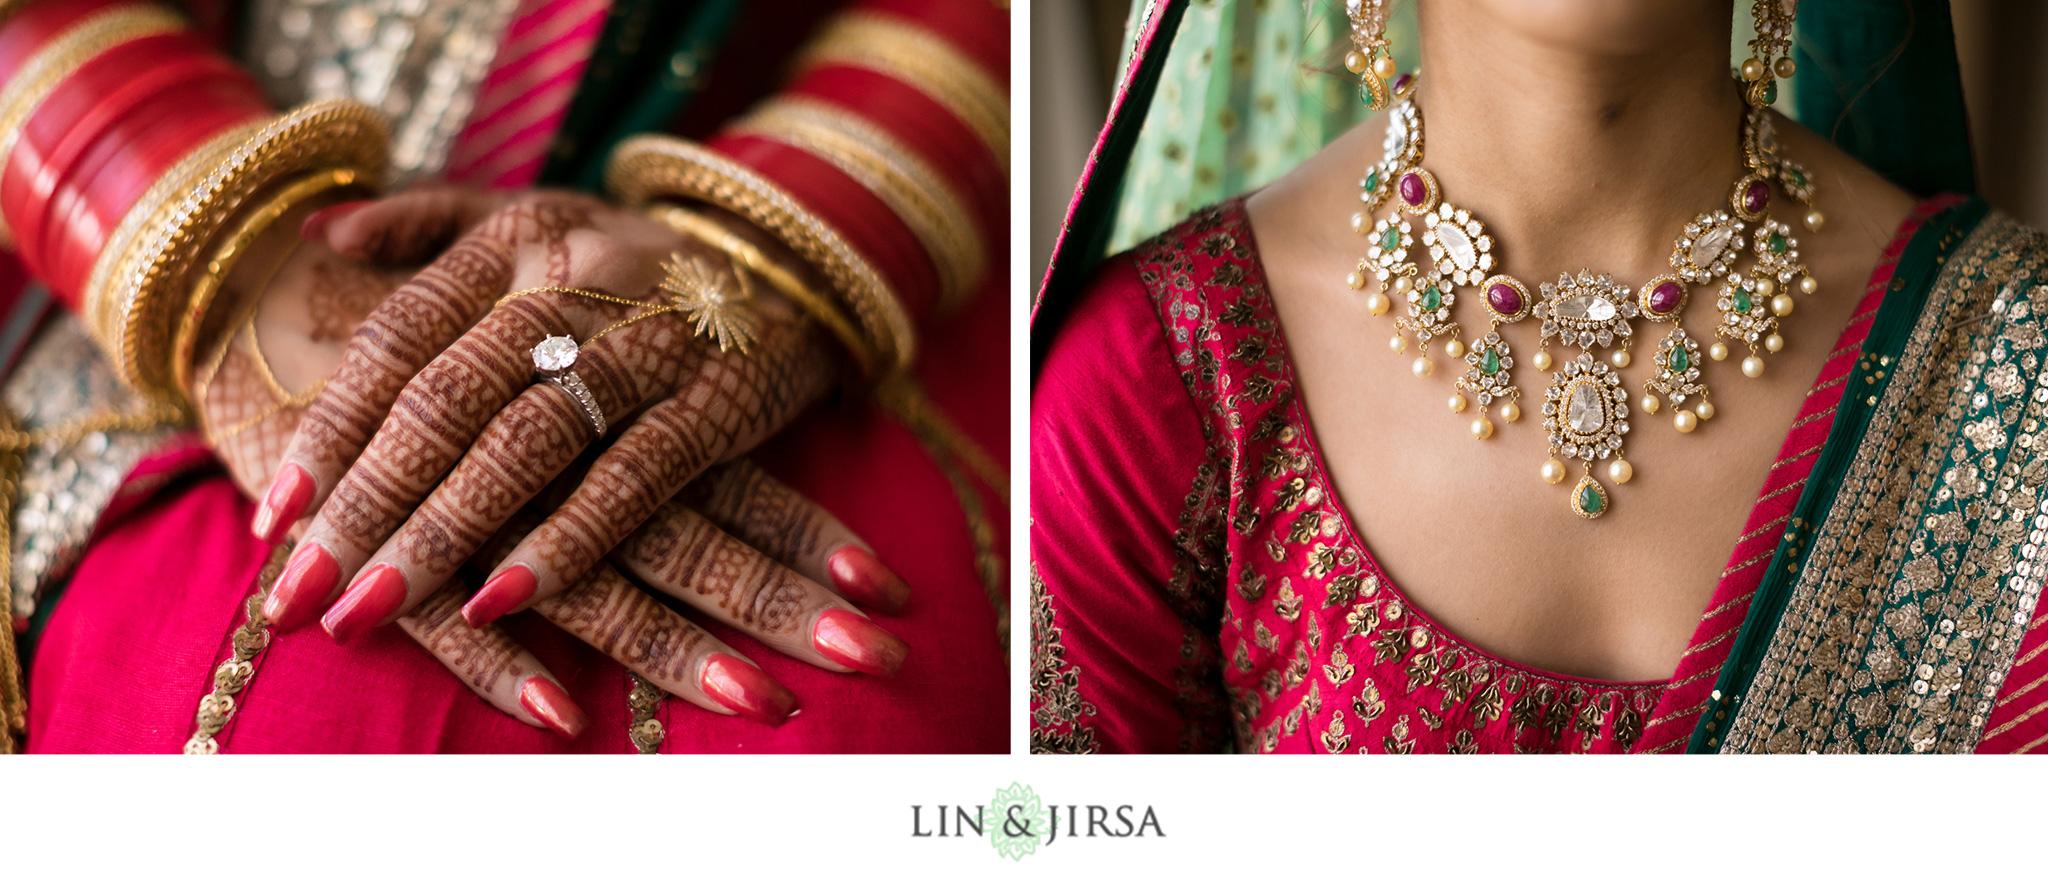 05-bellagio-las-vegas-indian-wedding-photography